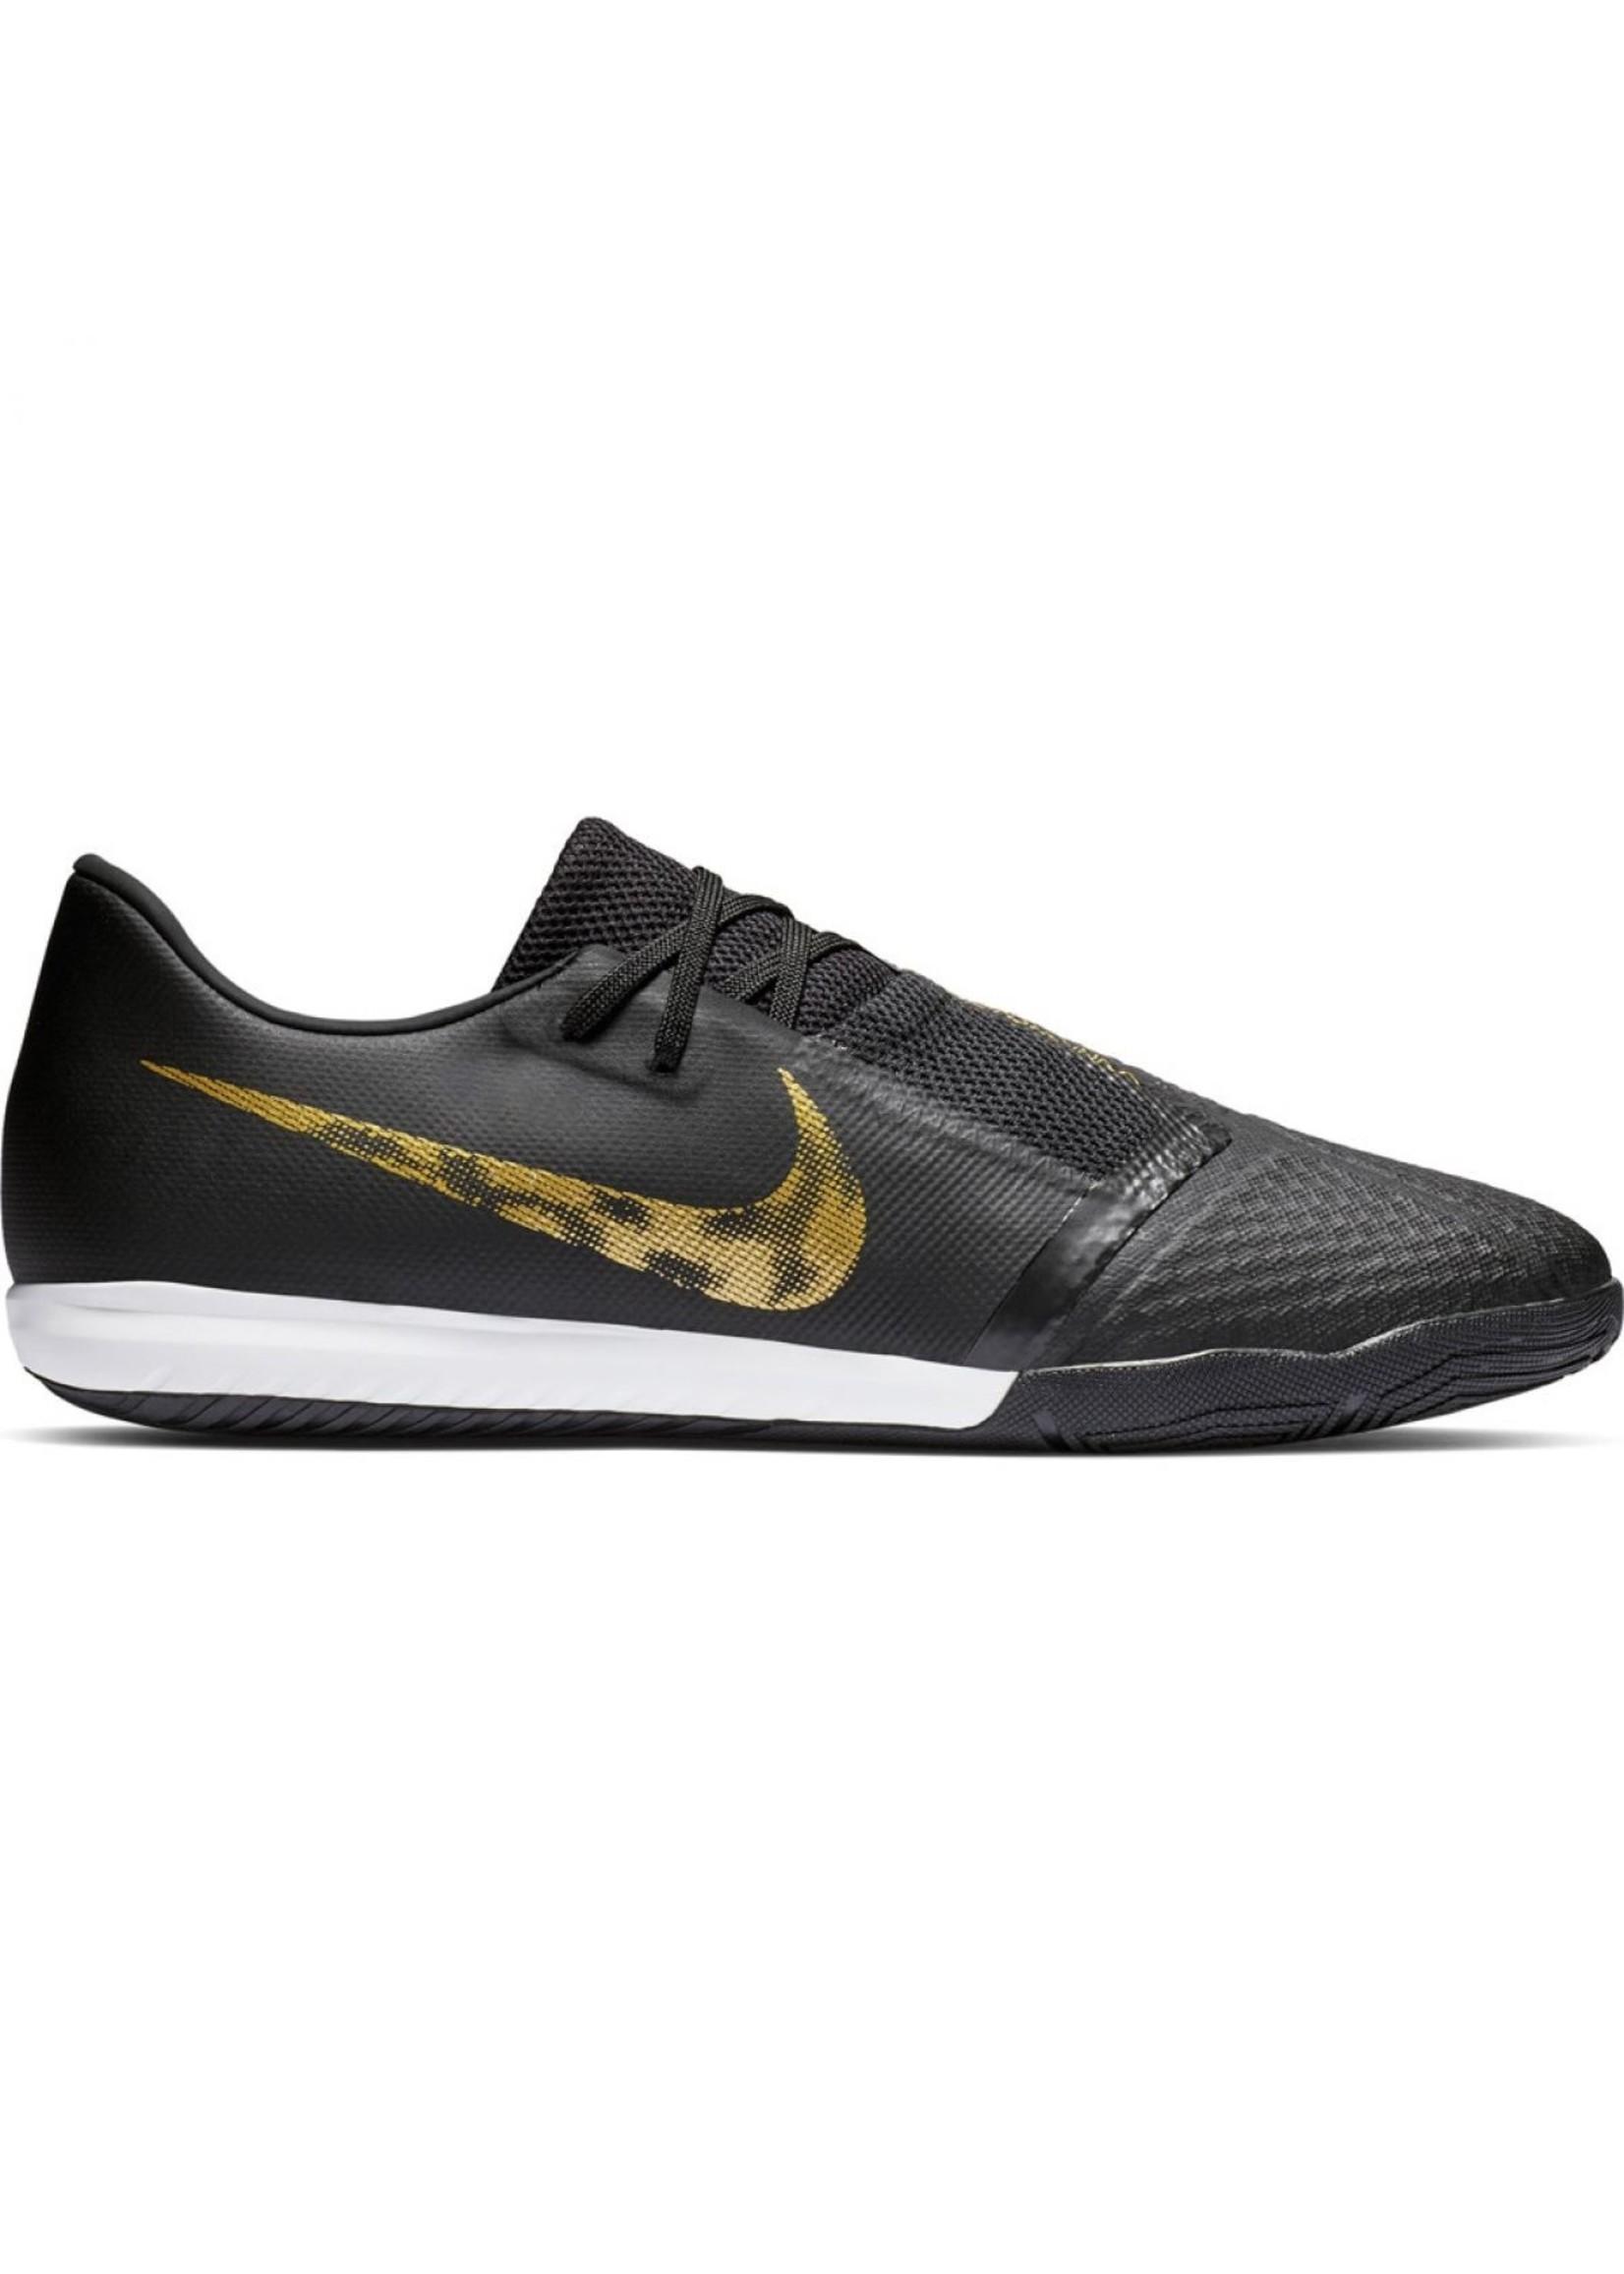 Nike Phantom Venom Academy IC - Black/Gold